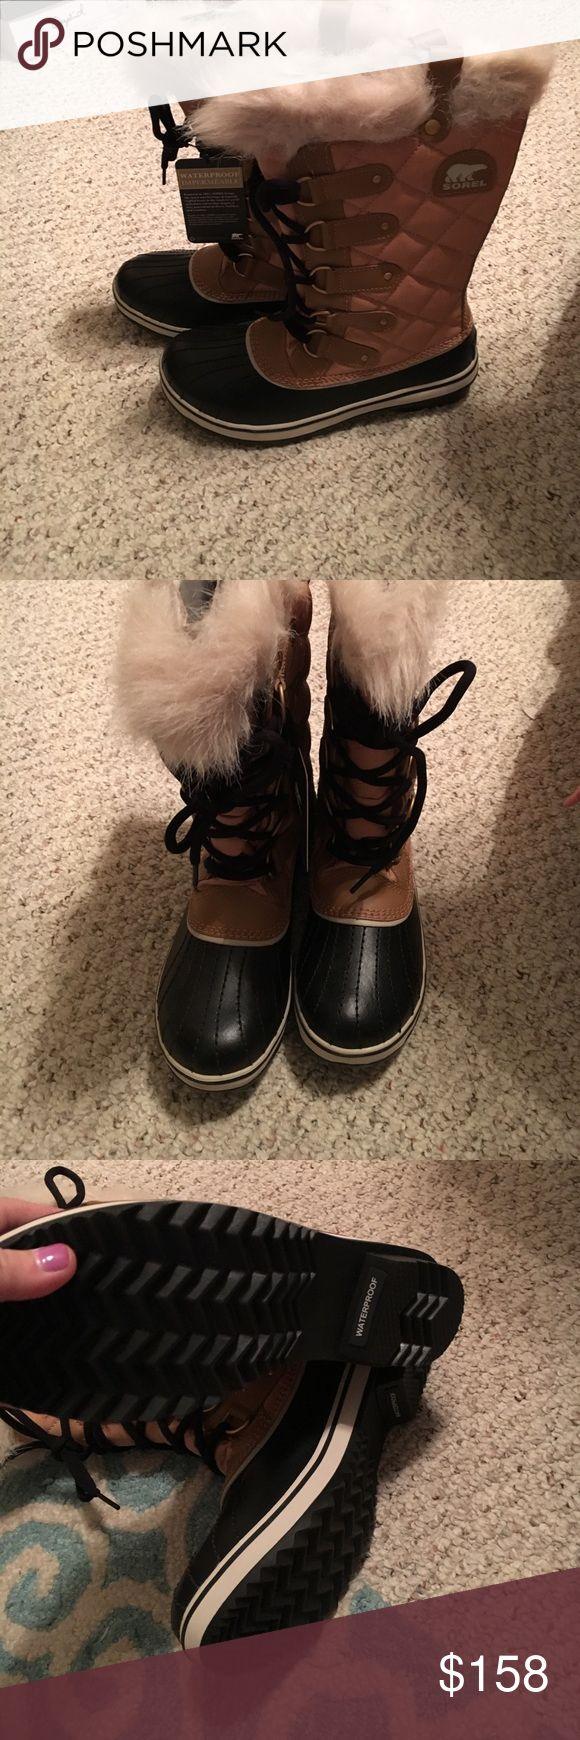 Sorel snow boots Sorel snow boots... size 8. Brand new in box Sorel Shoes Winter & Rain Boots